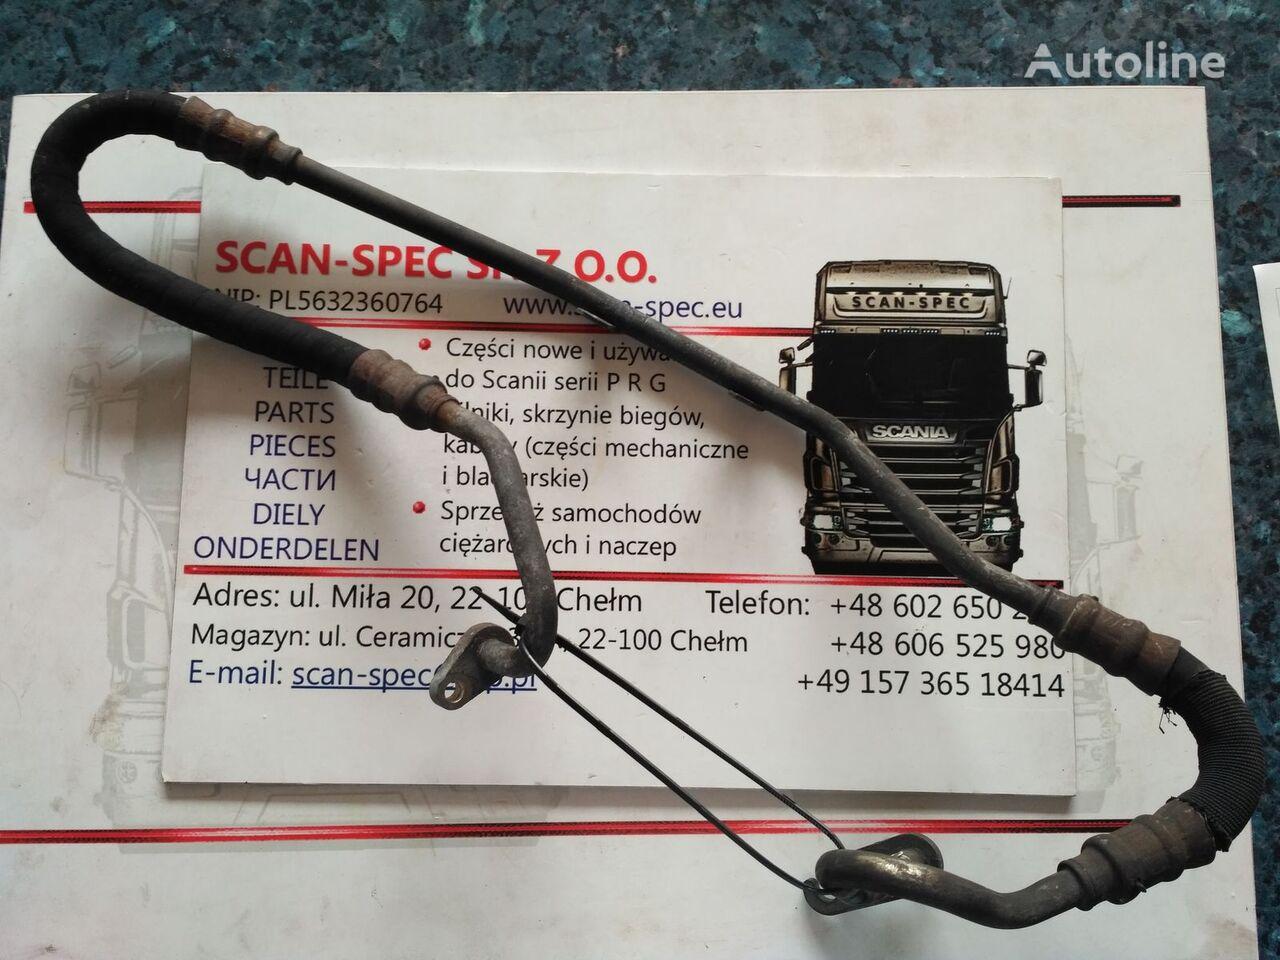 SCANIA (1852060) manguera de aire acondicionado para SCANIA P R G T tractora